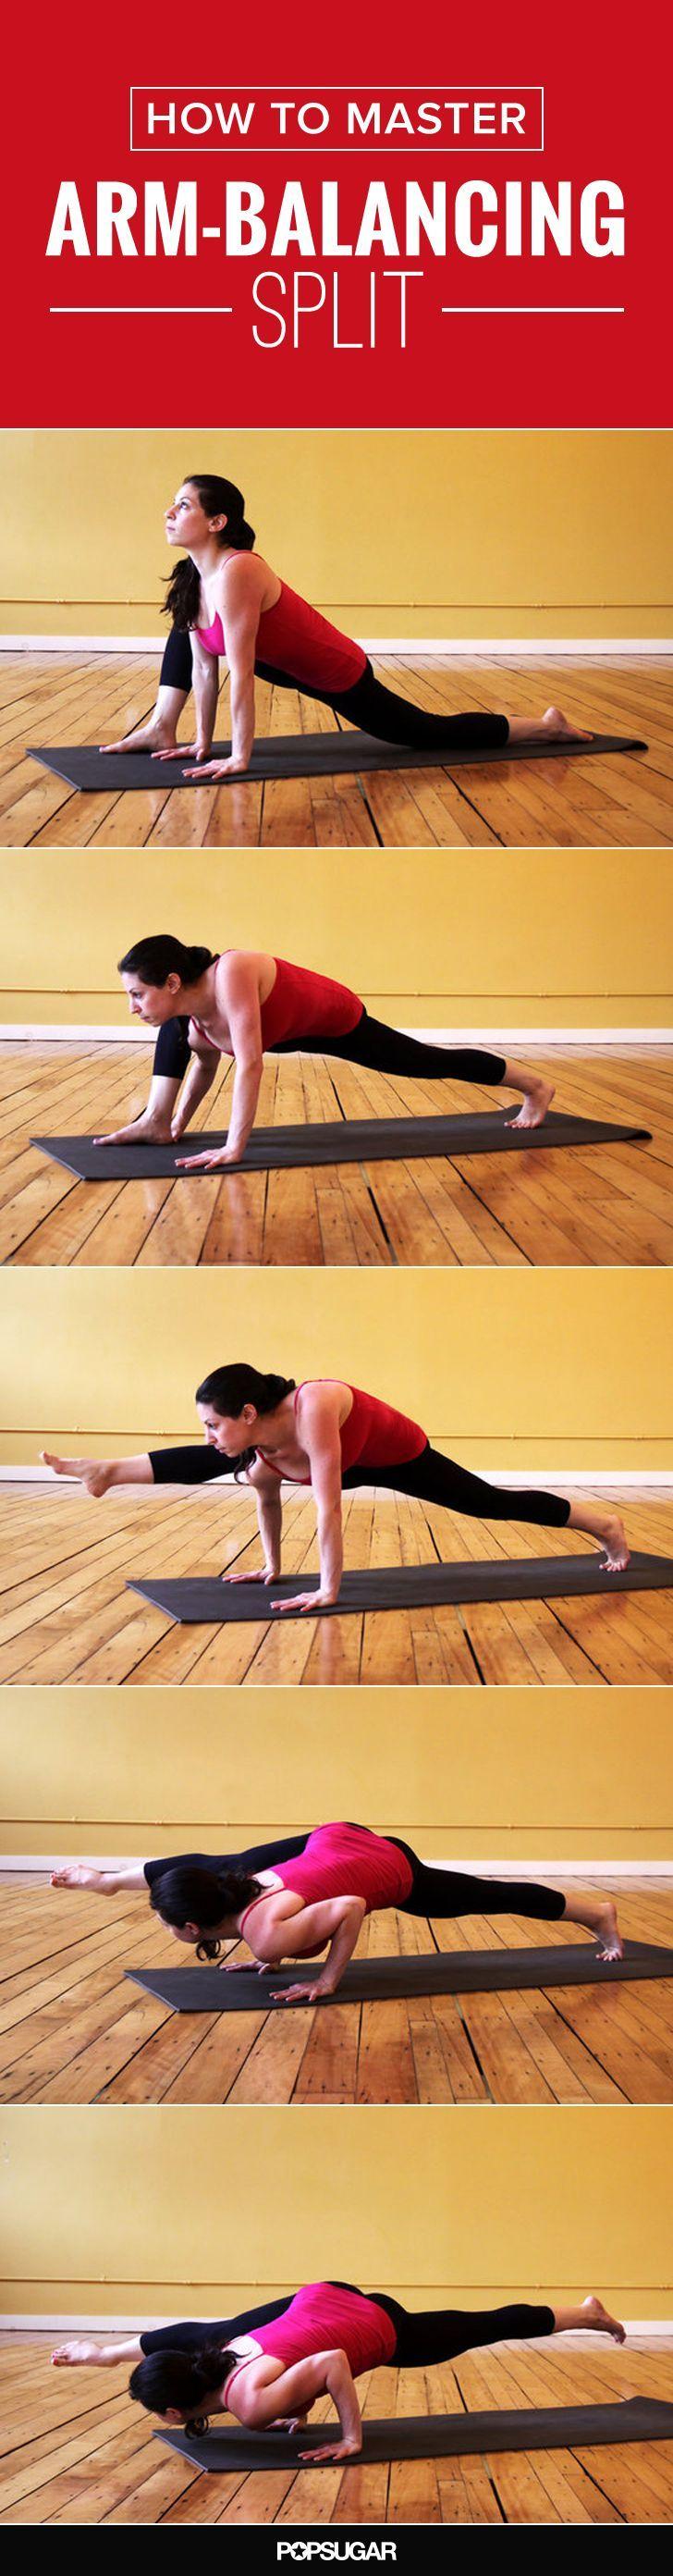 productos de yoga #fitness #yoga